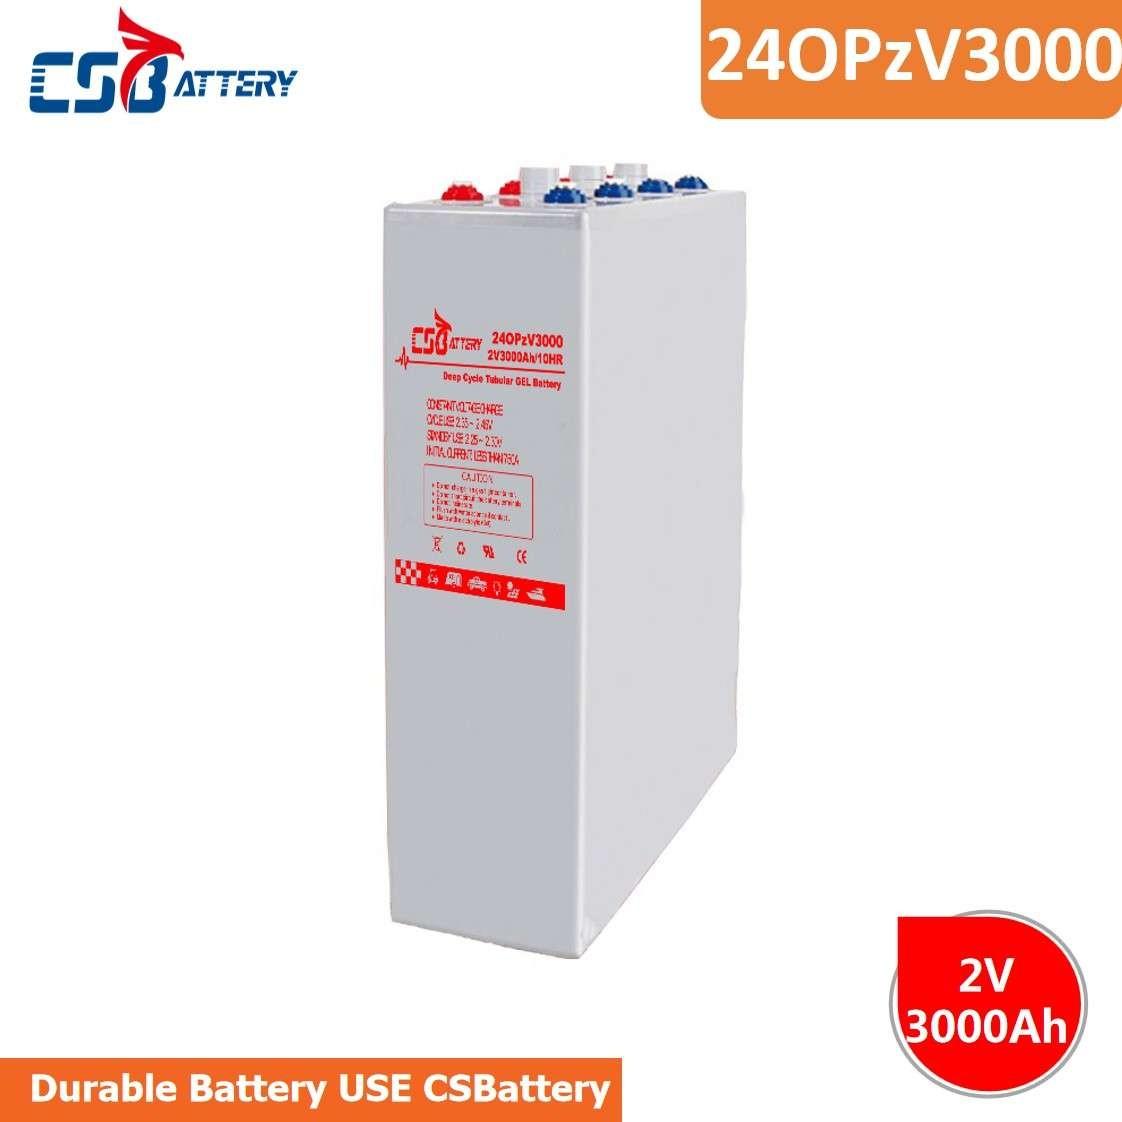 CSBattery 2V3000Ah畅销的20多年工作电池,用于电动加热器/机器/电动工具/草坪和灌溉系统